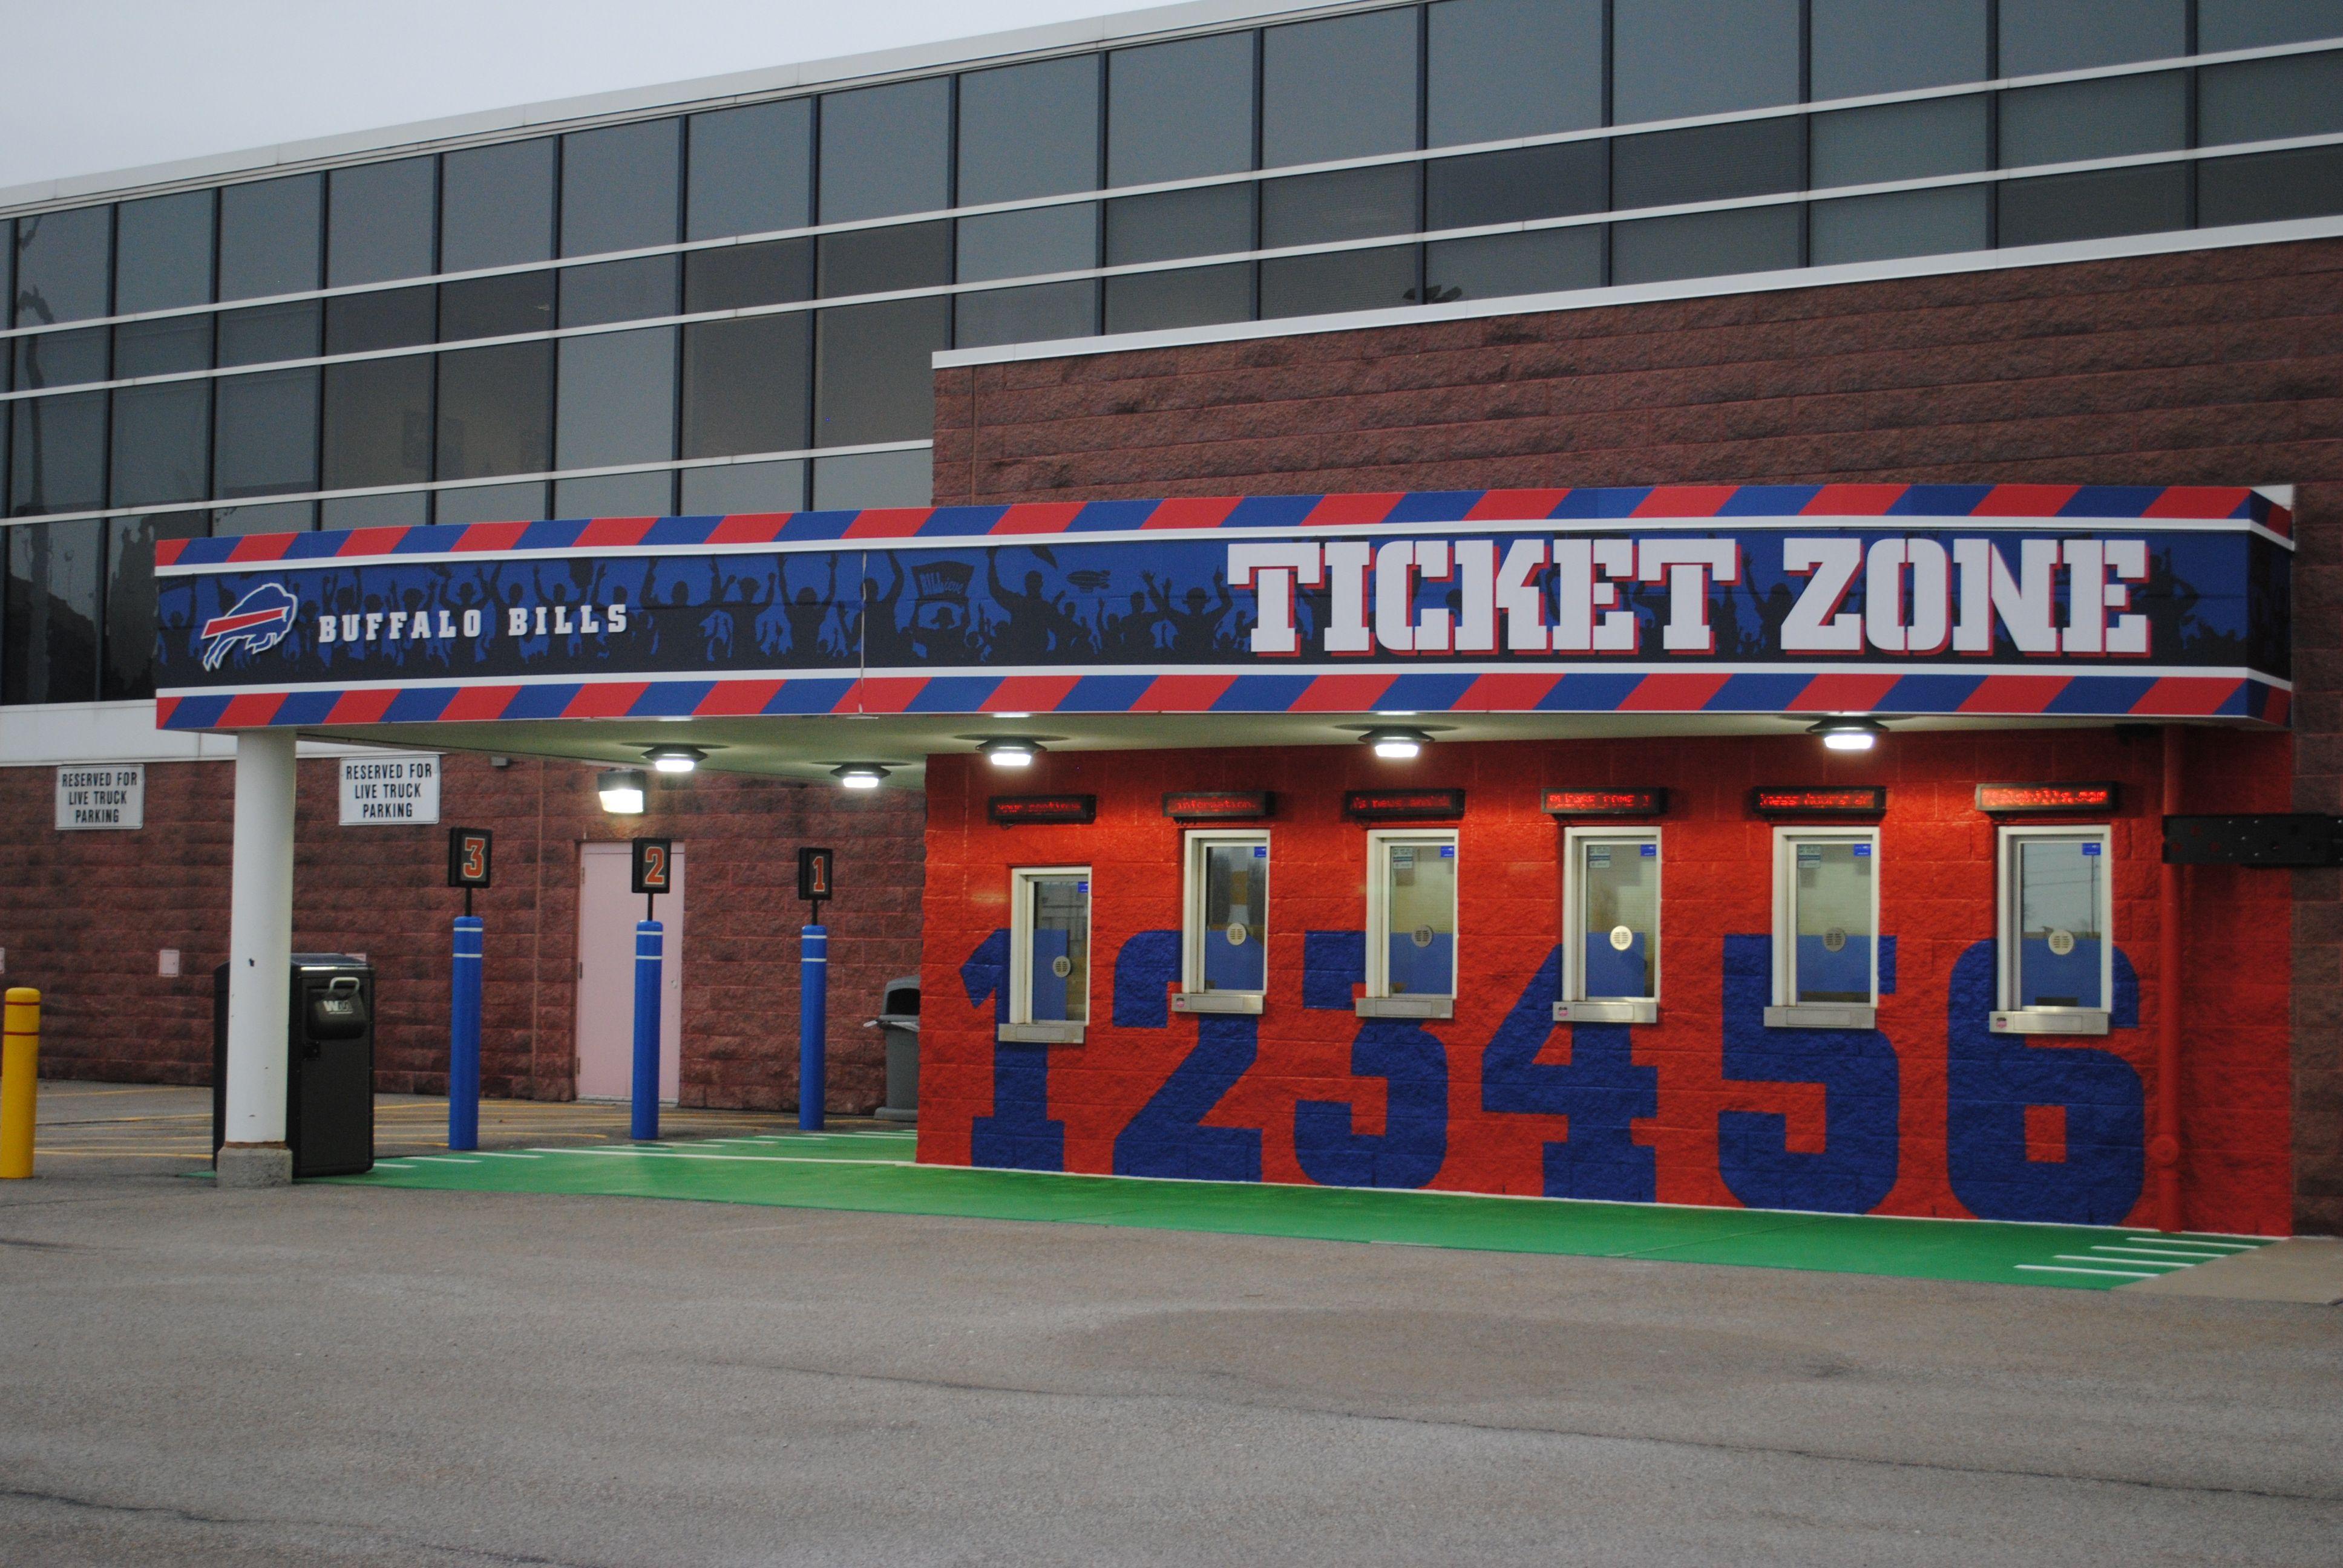 Ticket office google search ticket booth pinterest - Buffalo bills ticket office ...